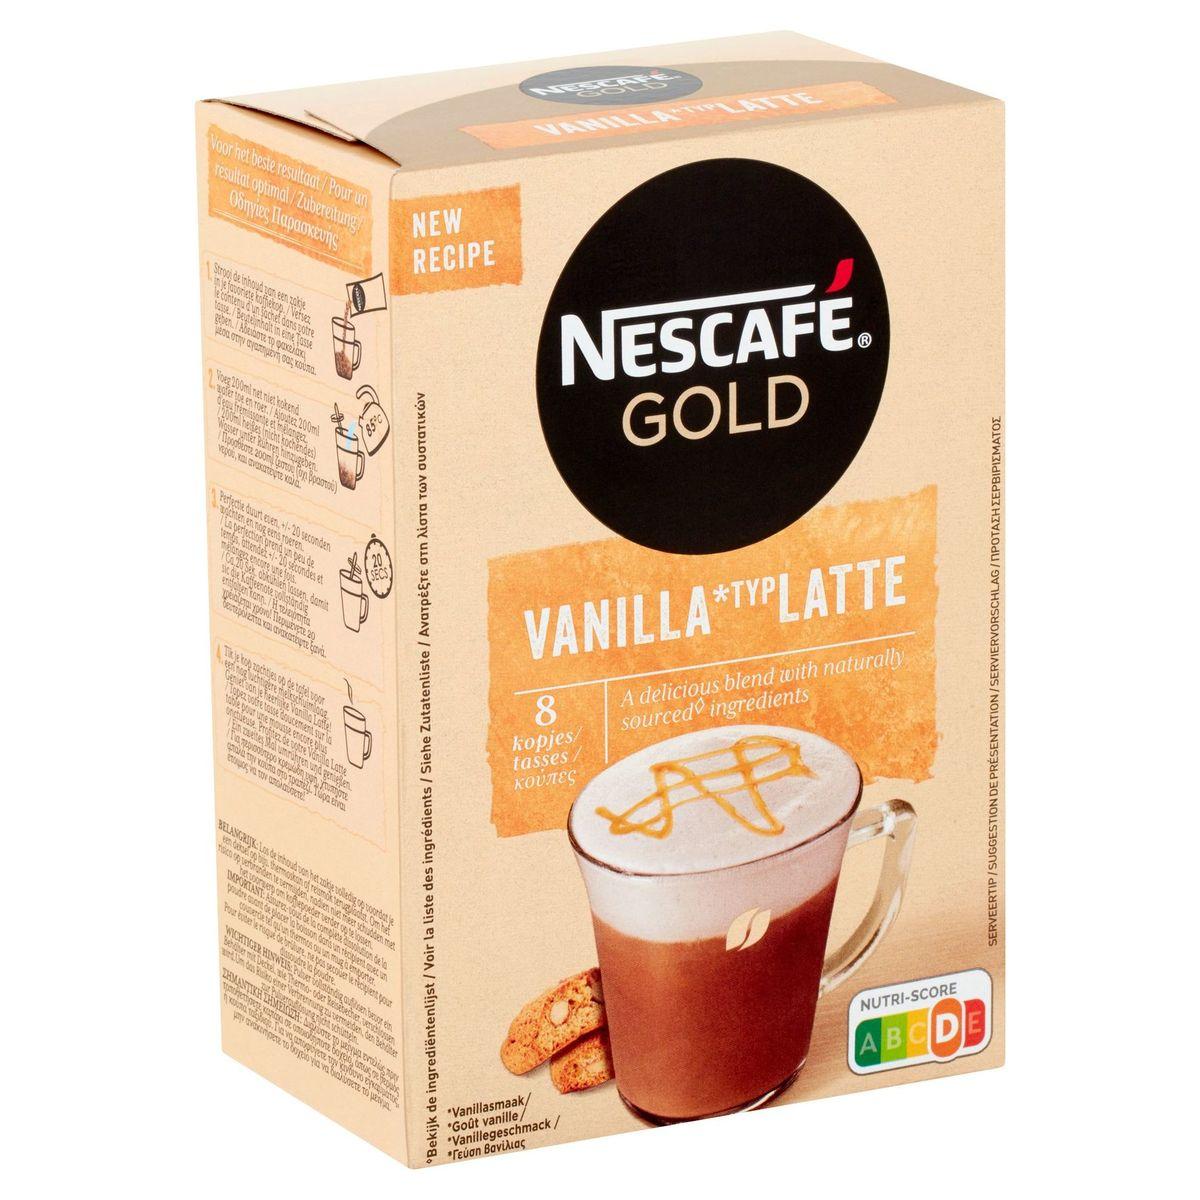 NESCAFE Café GOLD Vanilla Latte Sachets 148g